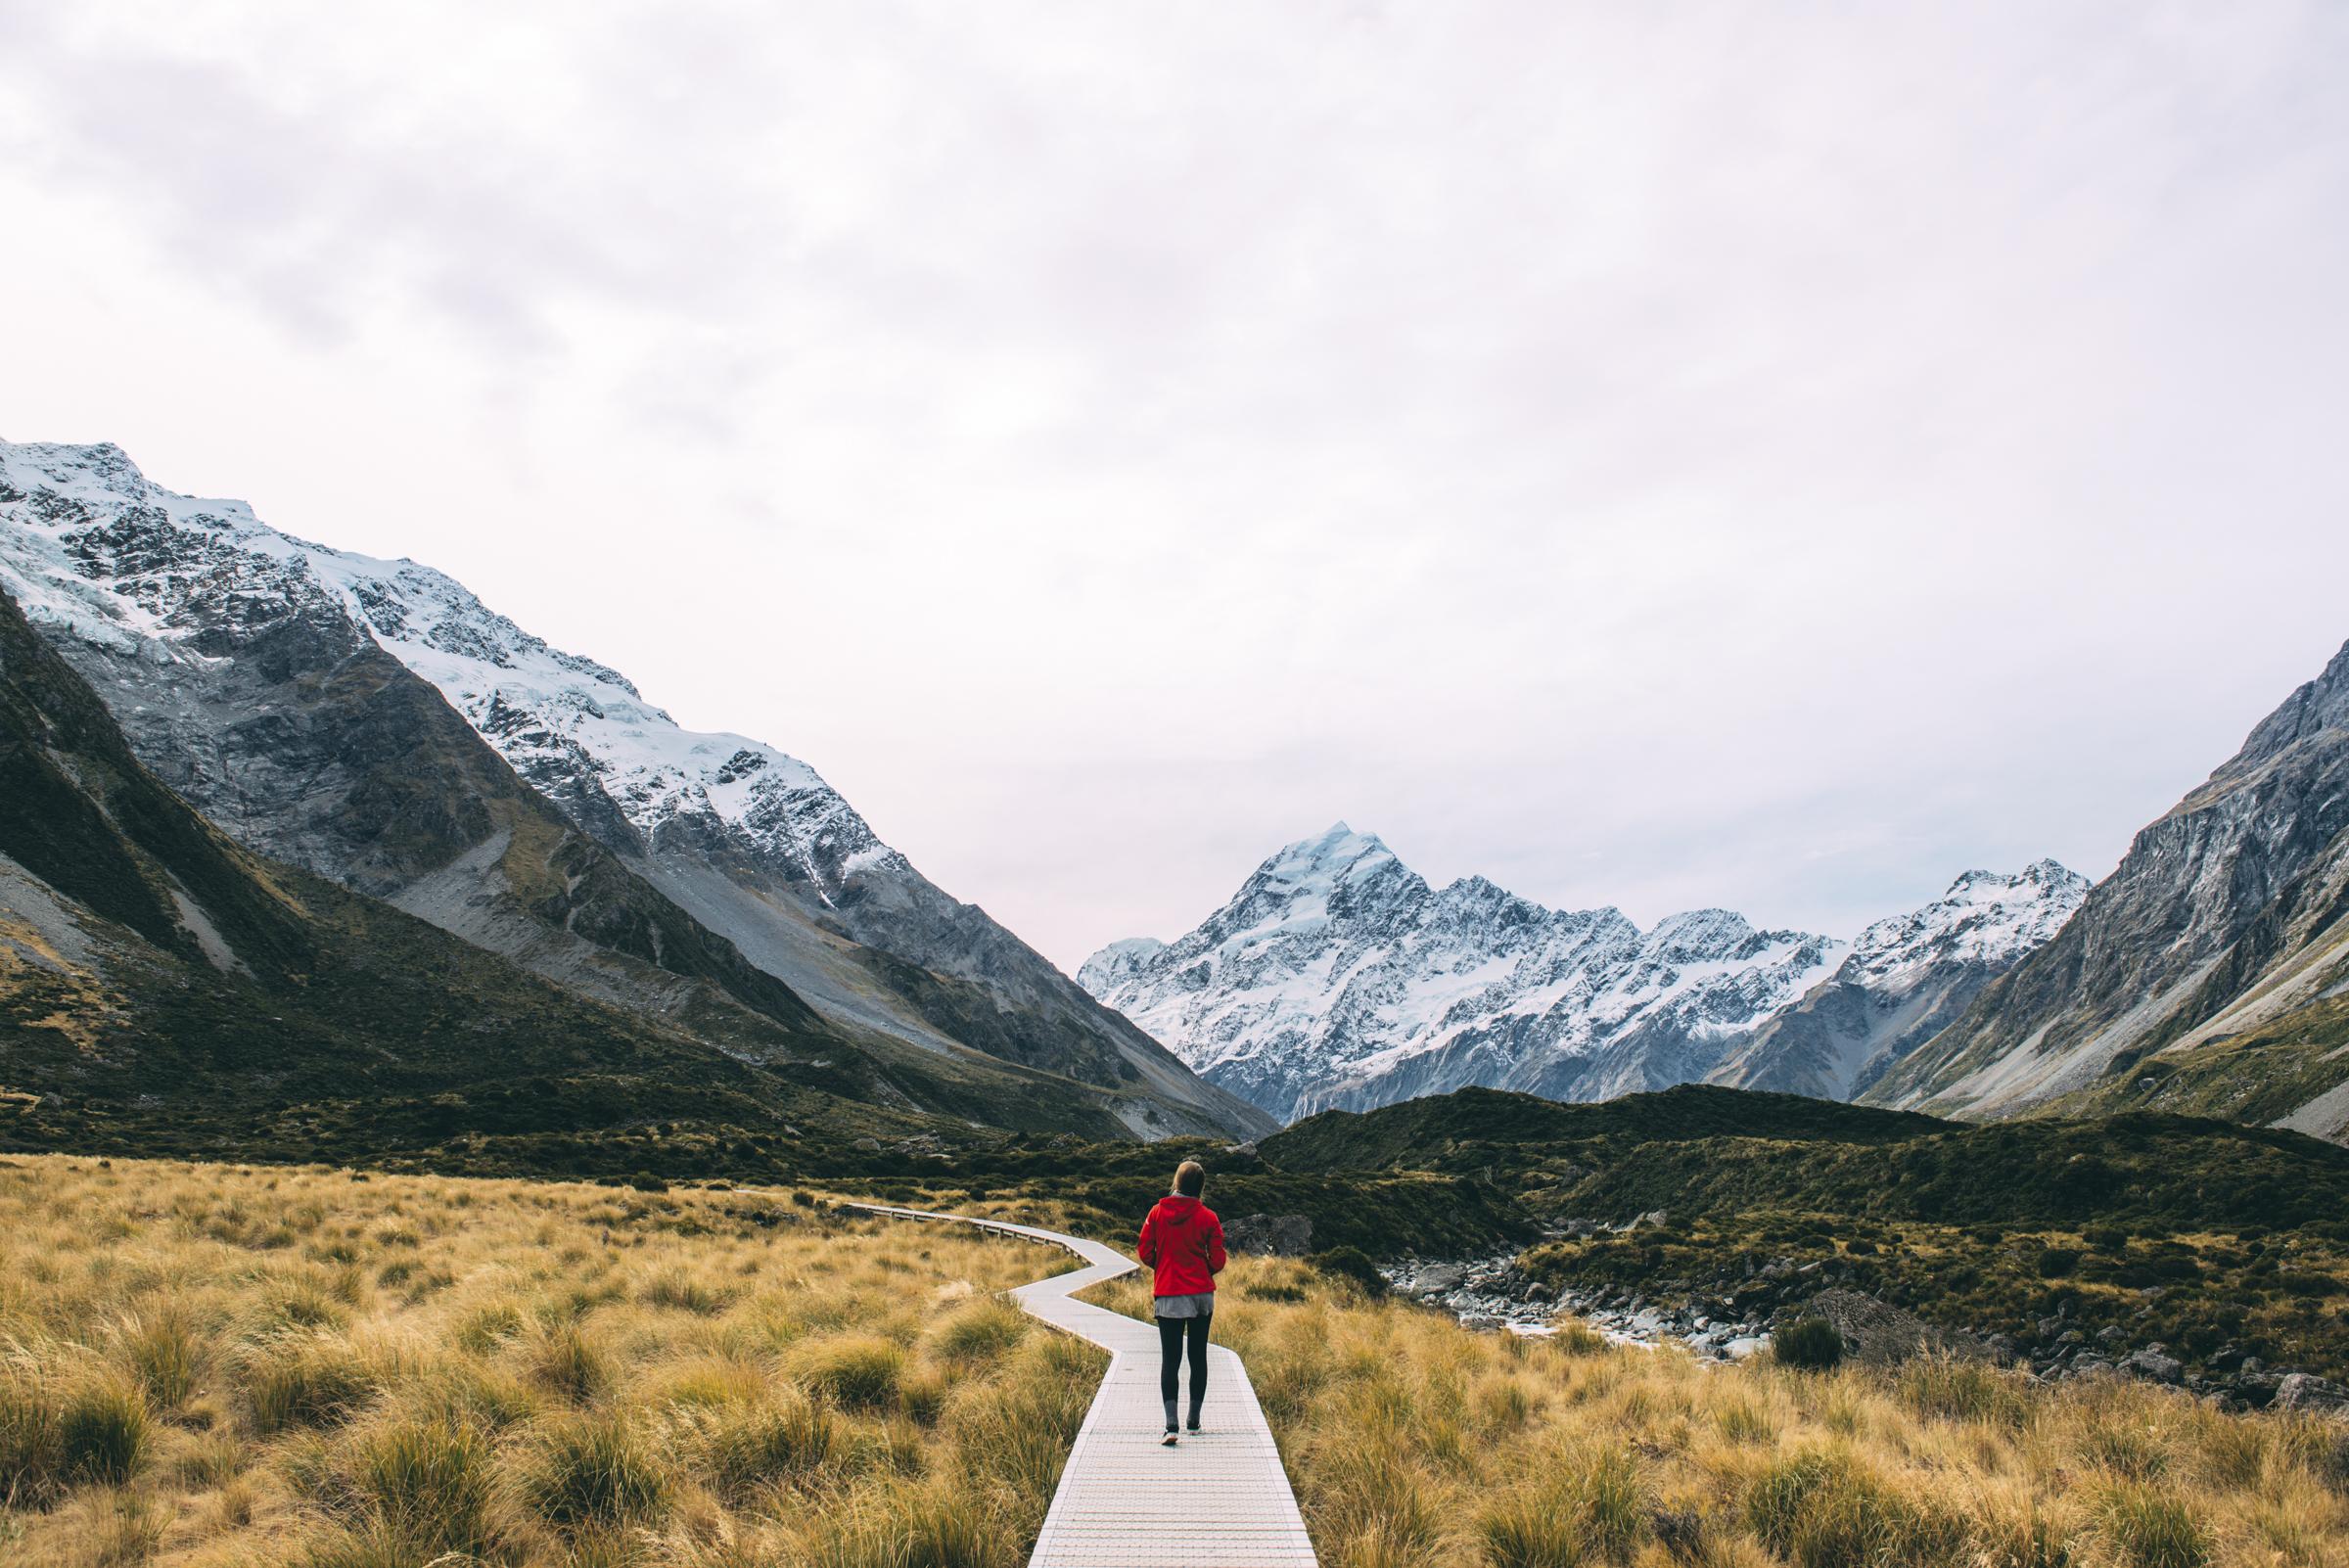 New Zealand Road Trip Lola Photography WEB_033.jpg